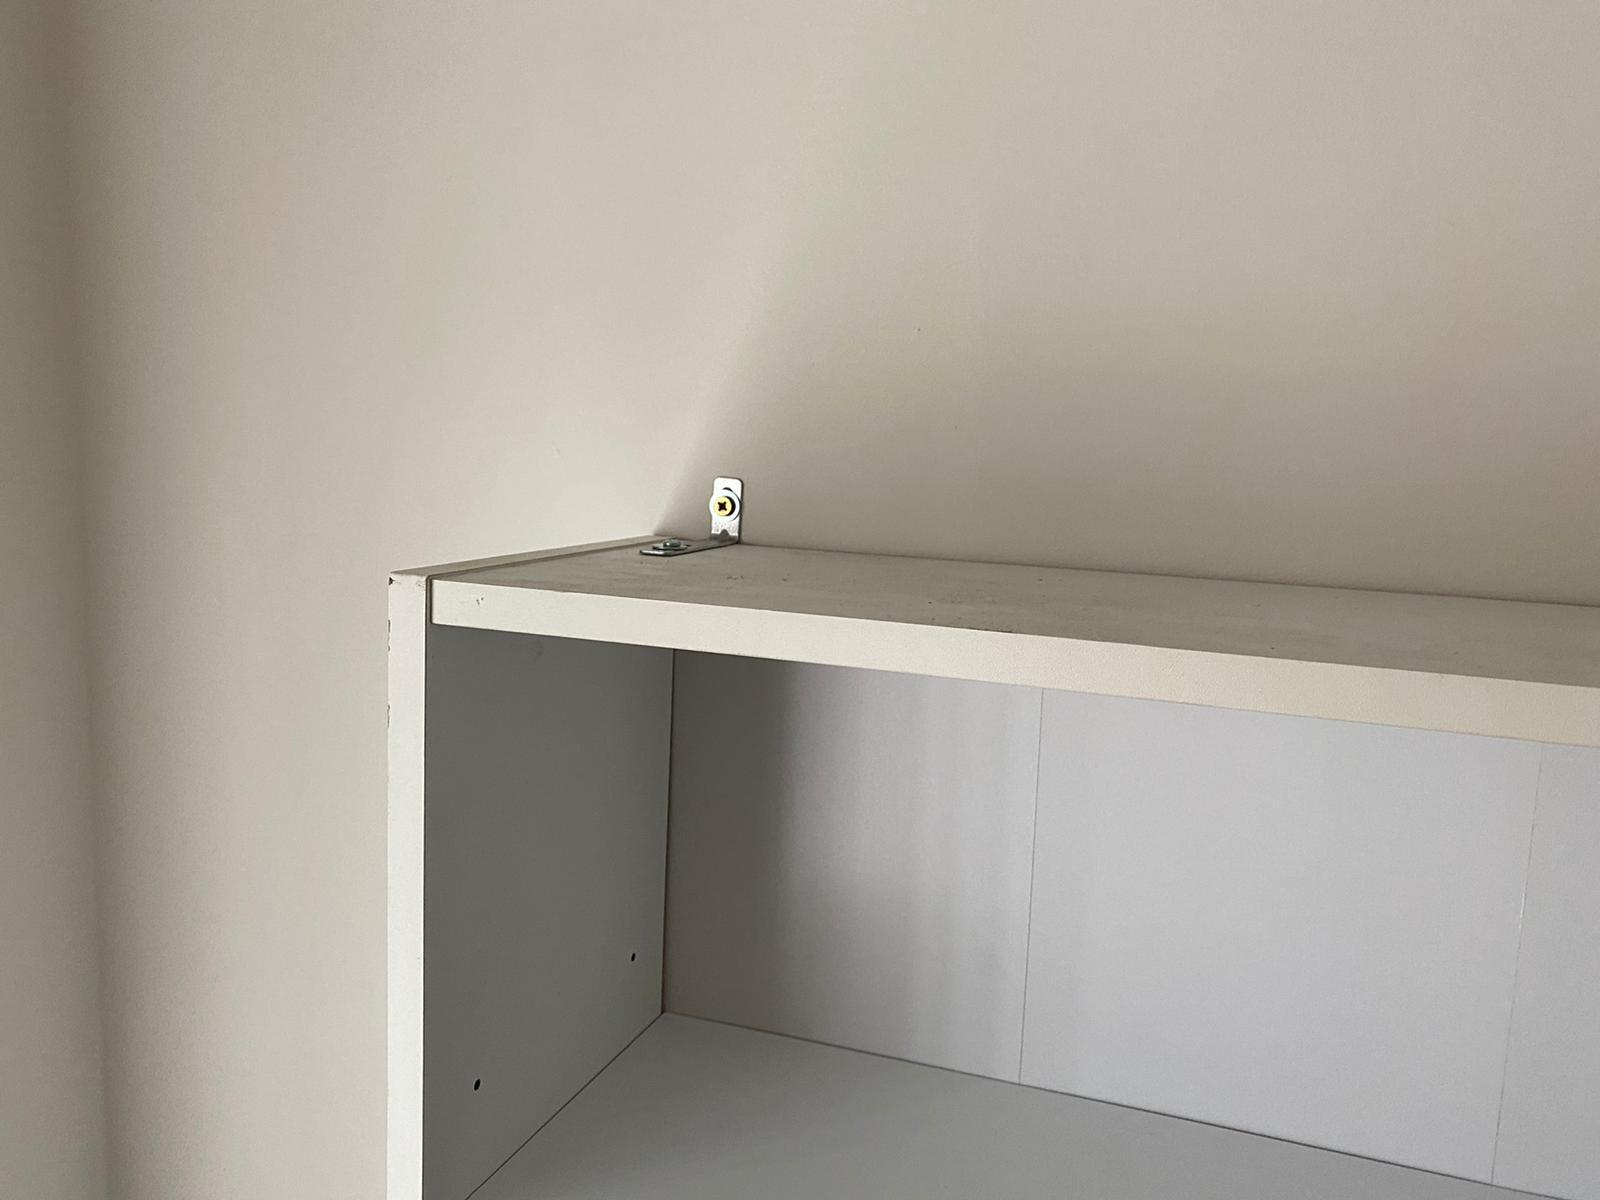 wardrobe installation in st helens